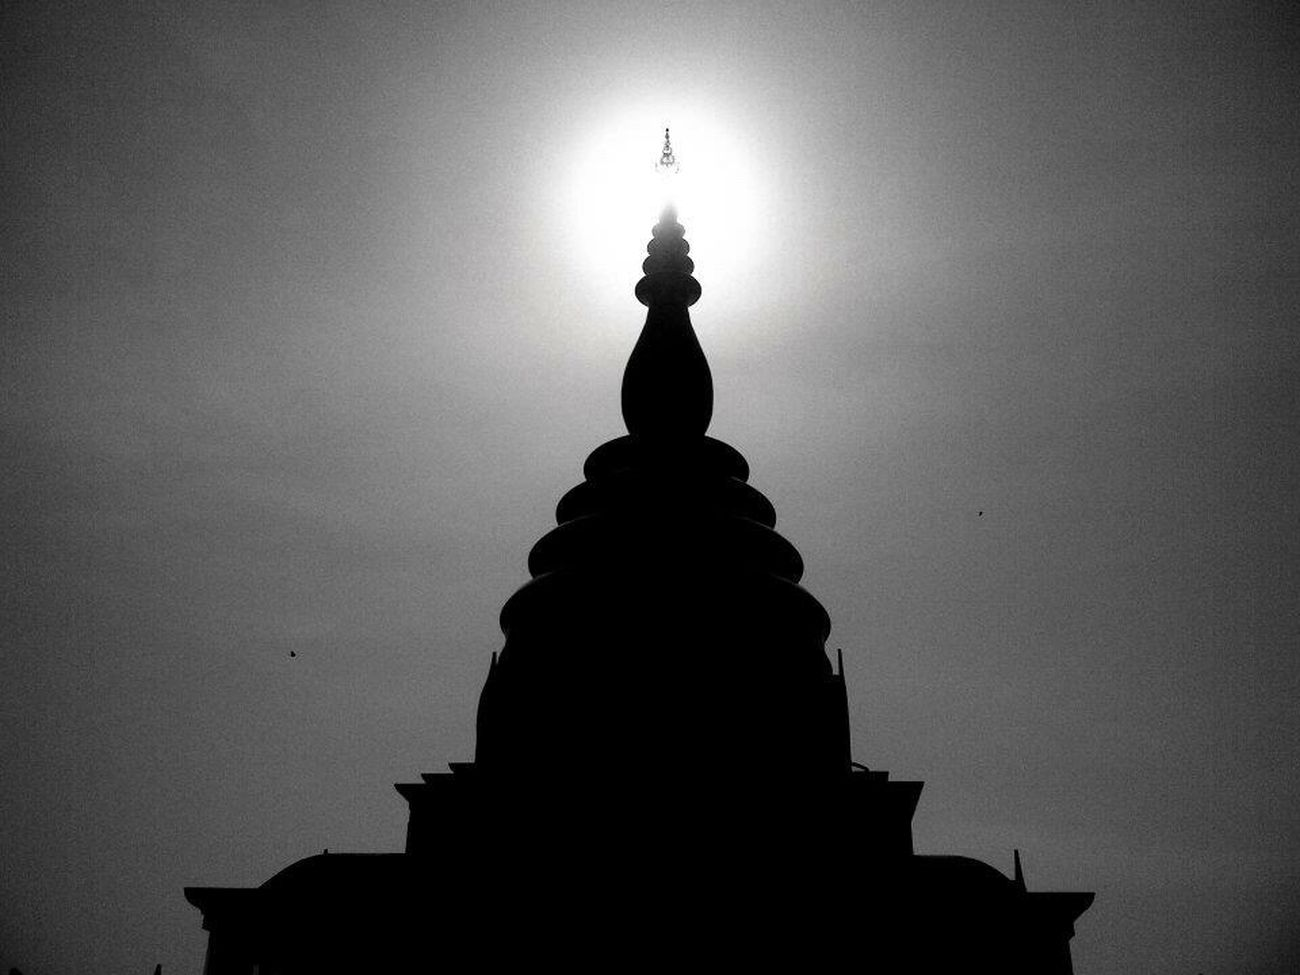 Pagoda Sunlight Architecture Silhouette Day Buddha Buddhist Temple Chiangrai Chiangmai Thai Thailand Religion Pray Blackandwhite